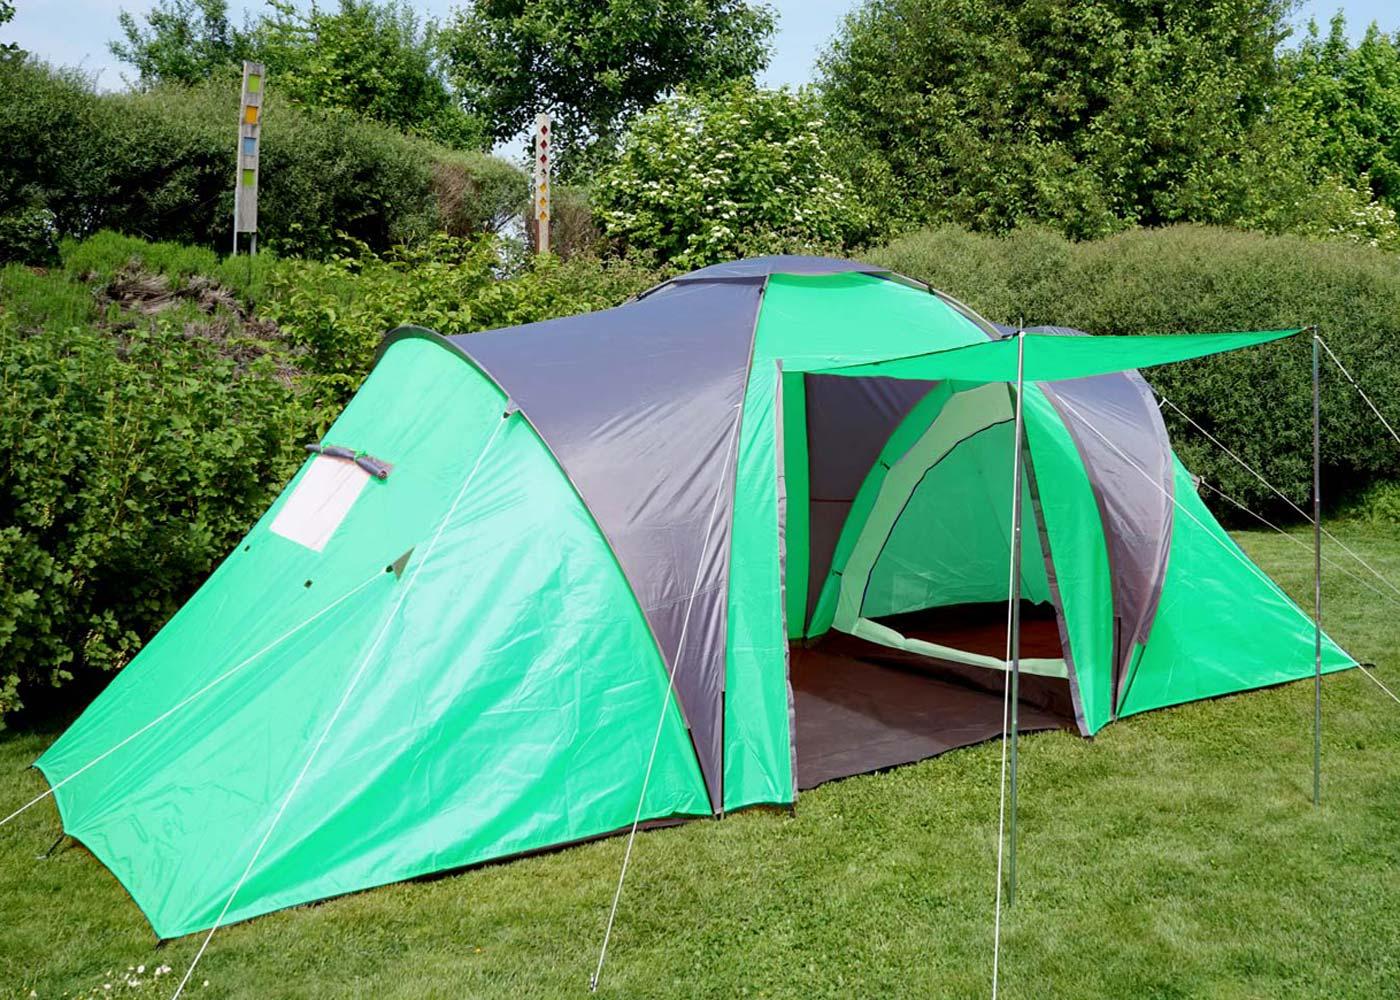 campingzelt loksa 4 mann zelt kuppelzelt igluzelt festival zelt 4 personen gr n. Black Bedroom Furniture Sets. Home Design Ideas